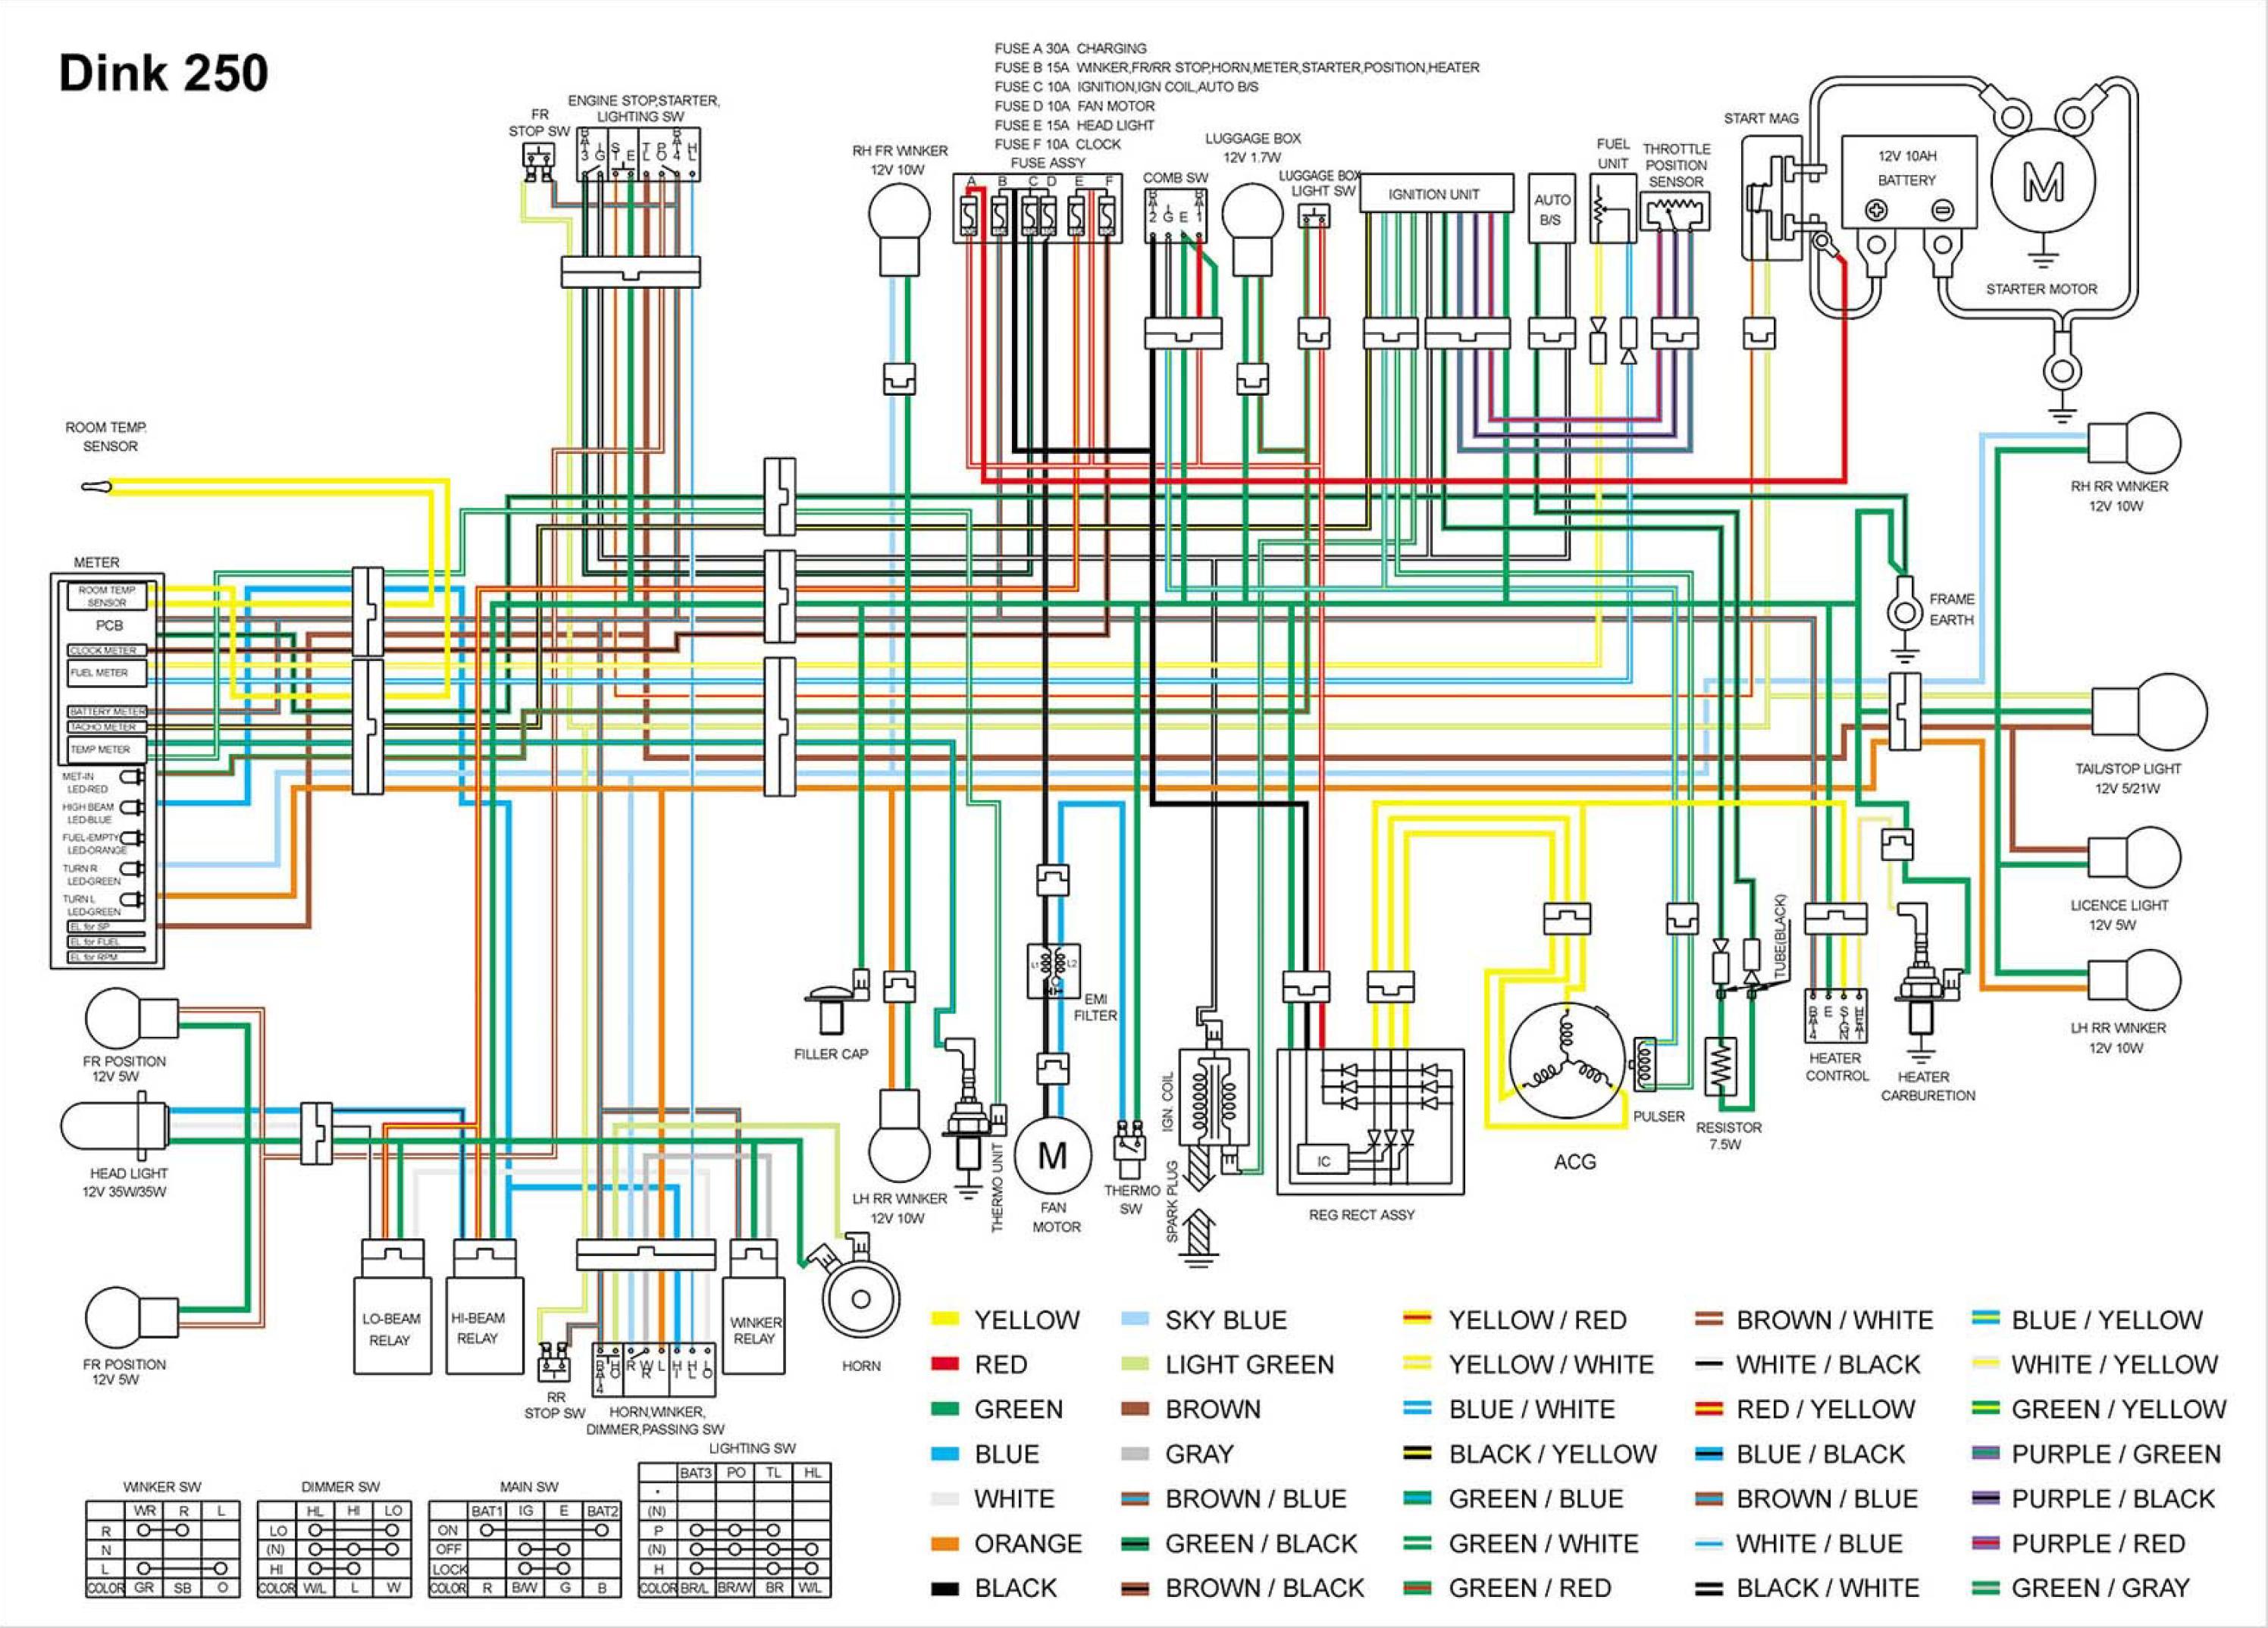 hight resolution of download moto schem kymco dink 250 d250 moto schem kymco dink 250 d250